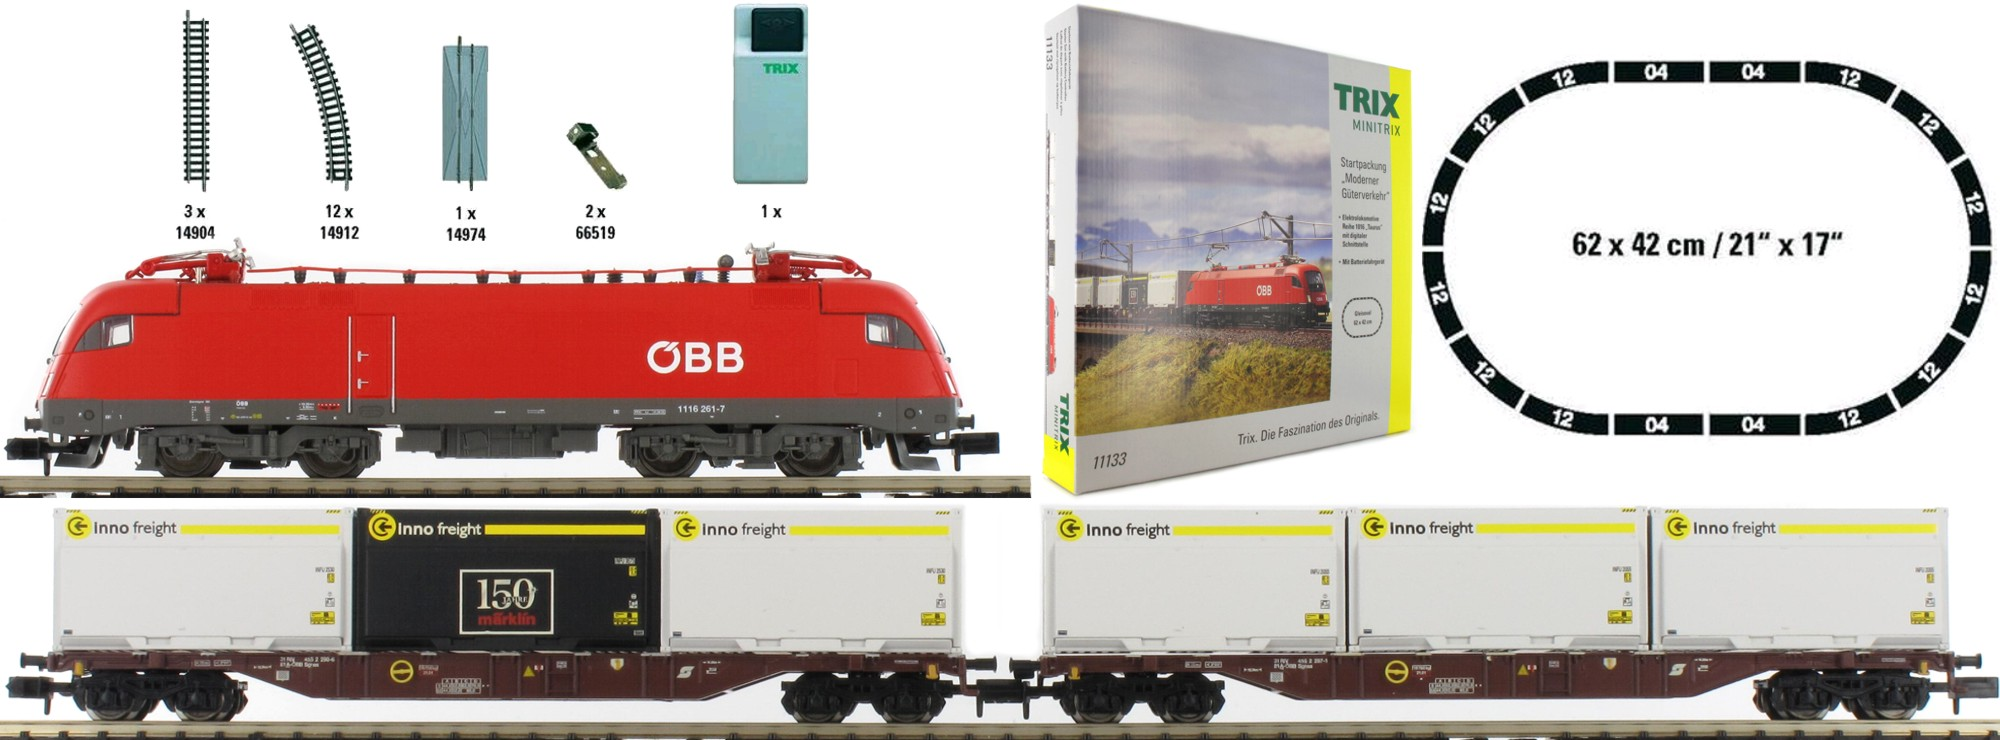 N Scale - Minitrix - 11133 - Mixed Freight Consist, Europe Epoch VI - ÖBB (Austrian Federal Railways) - 3-Unit Starter Set